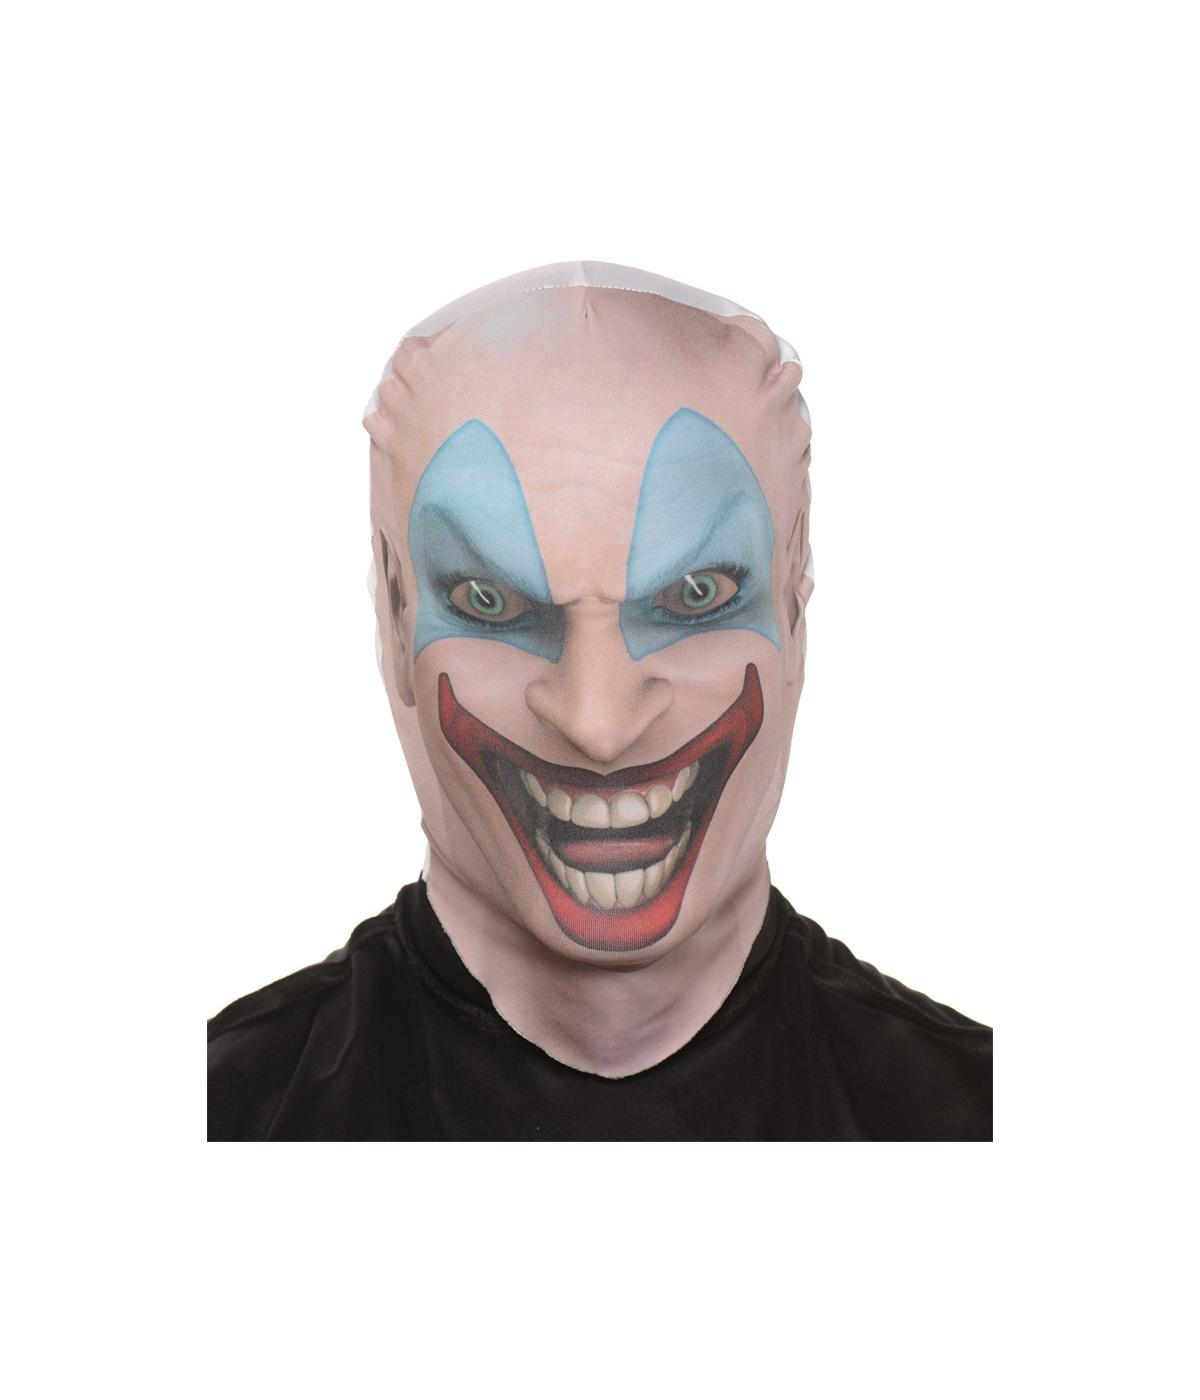 Killer Clown Skin Mask Masks